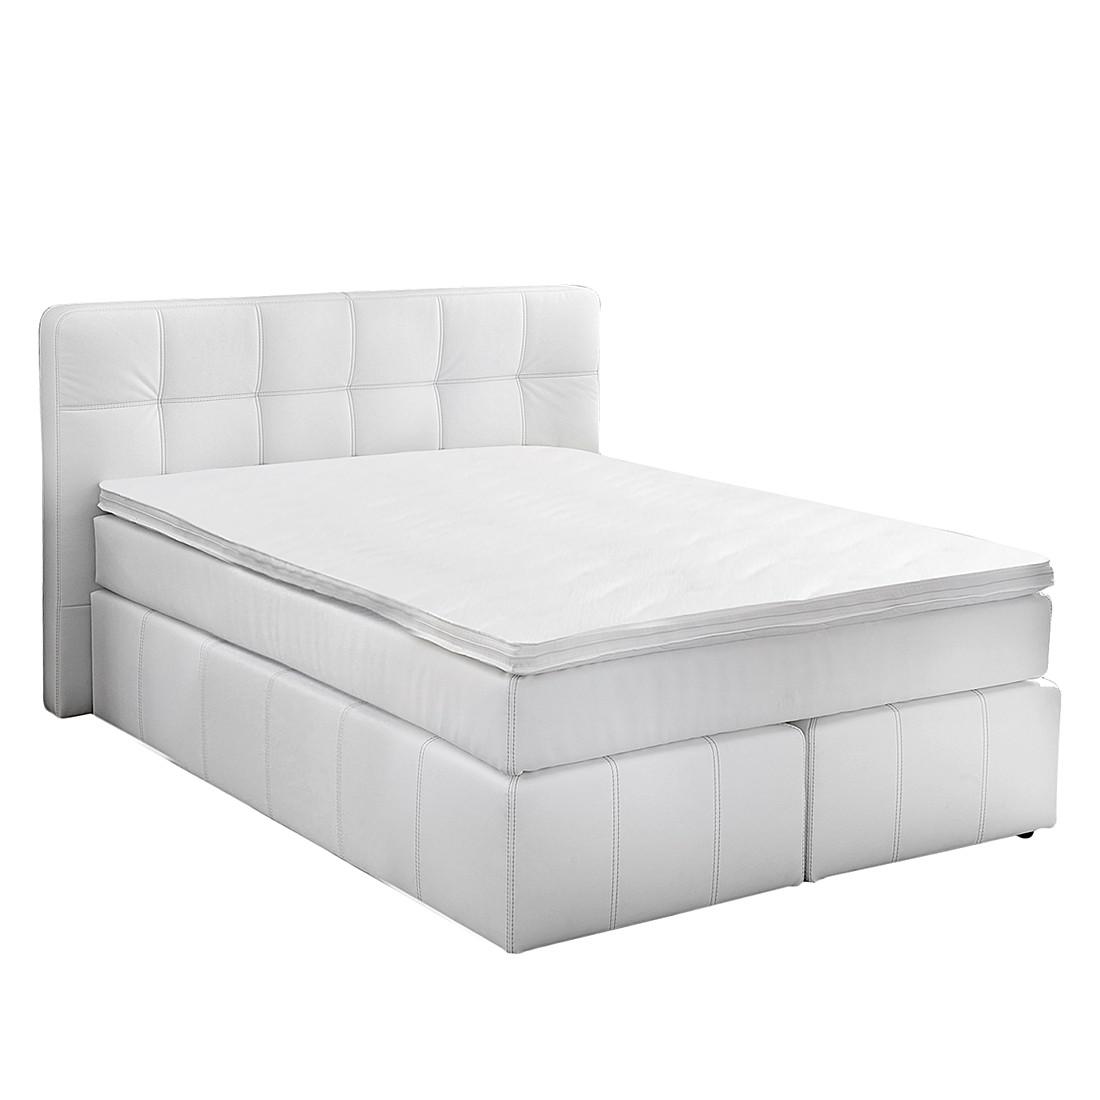 betten leder weiss 140x200 preisvergleiche. Black Bedroom Furniture Sets. Home Design Ideas